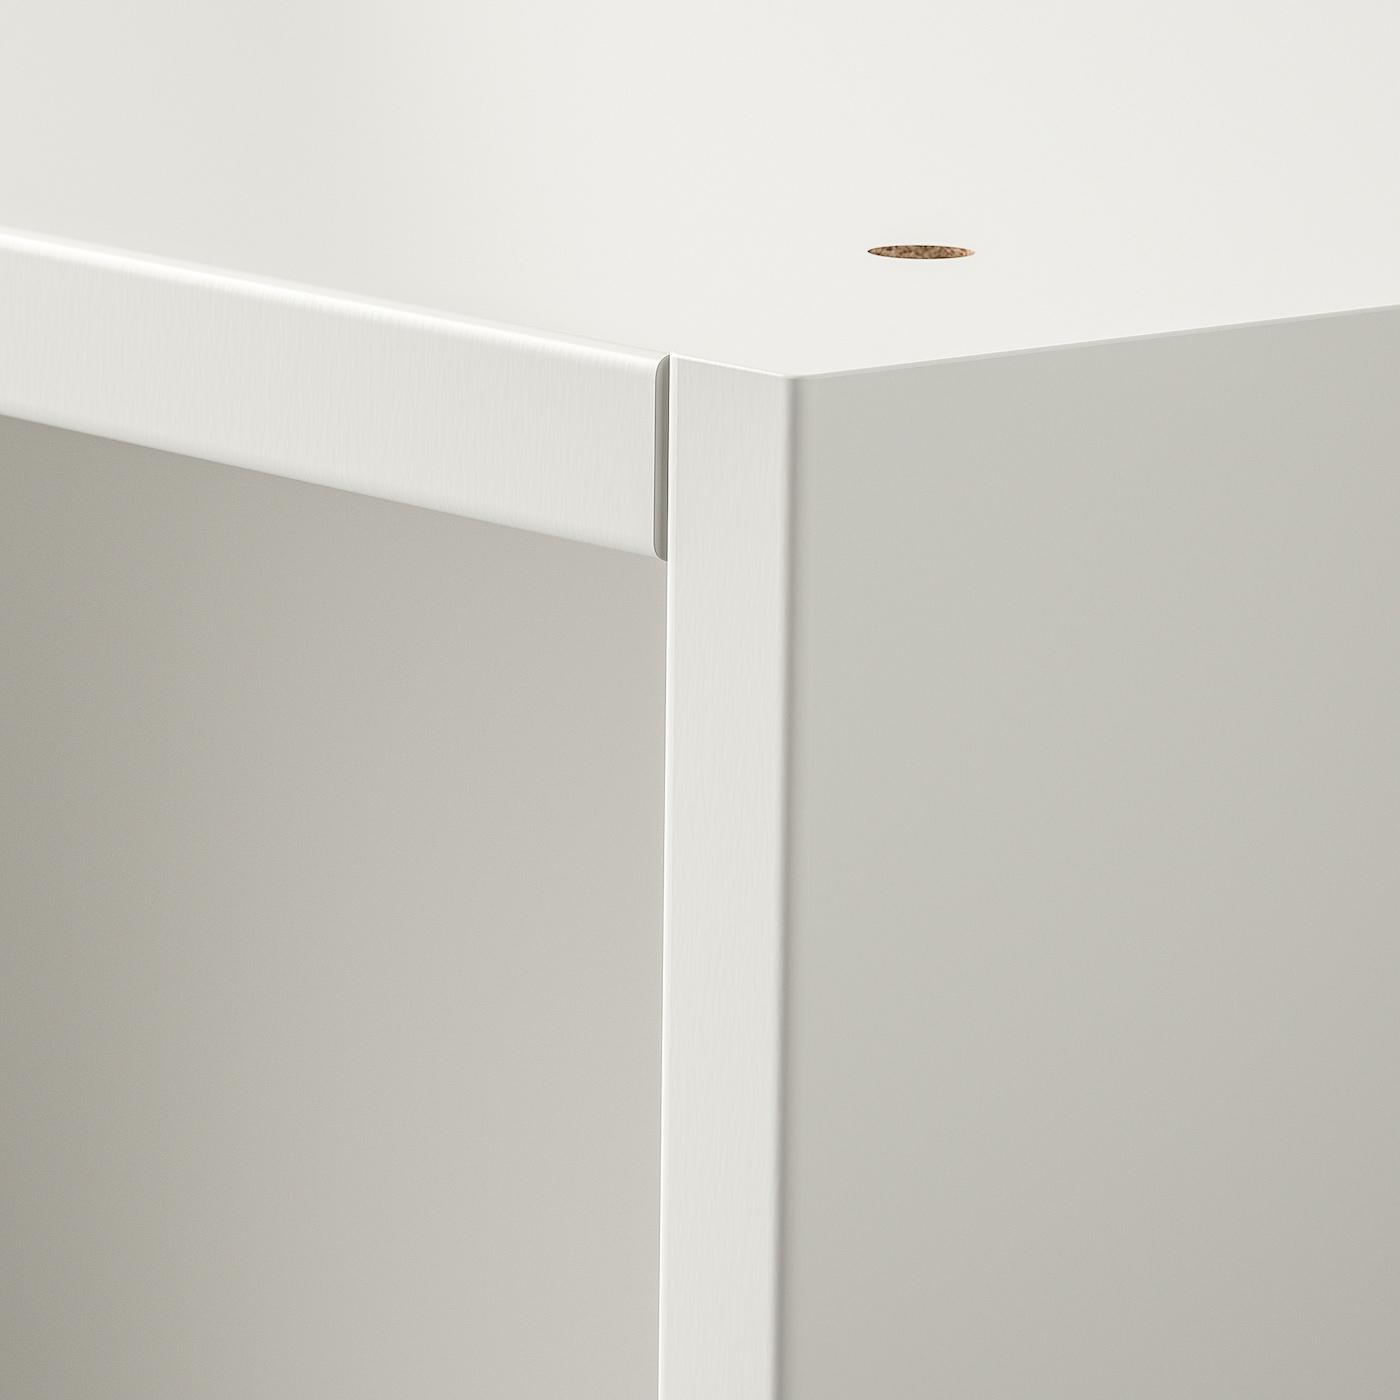 PAX هيكل خزانة الملابس, أبيض, 100x58x236 سم